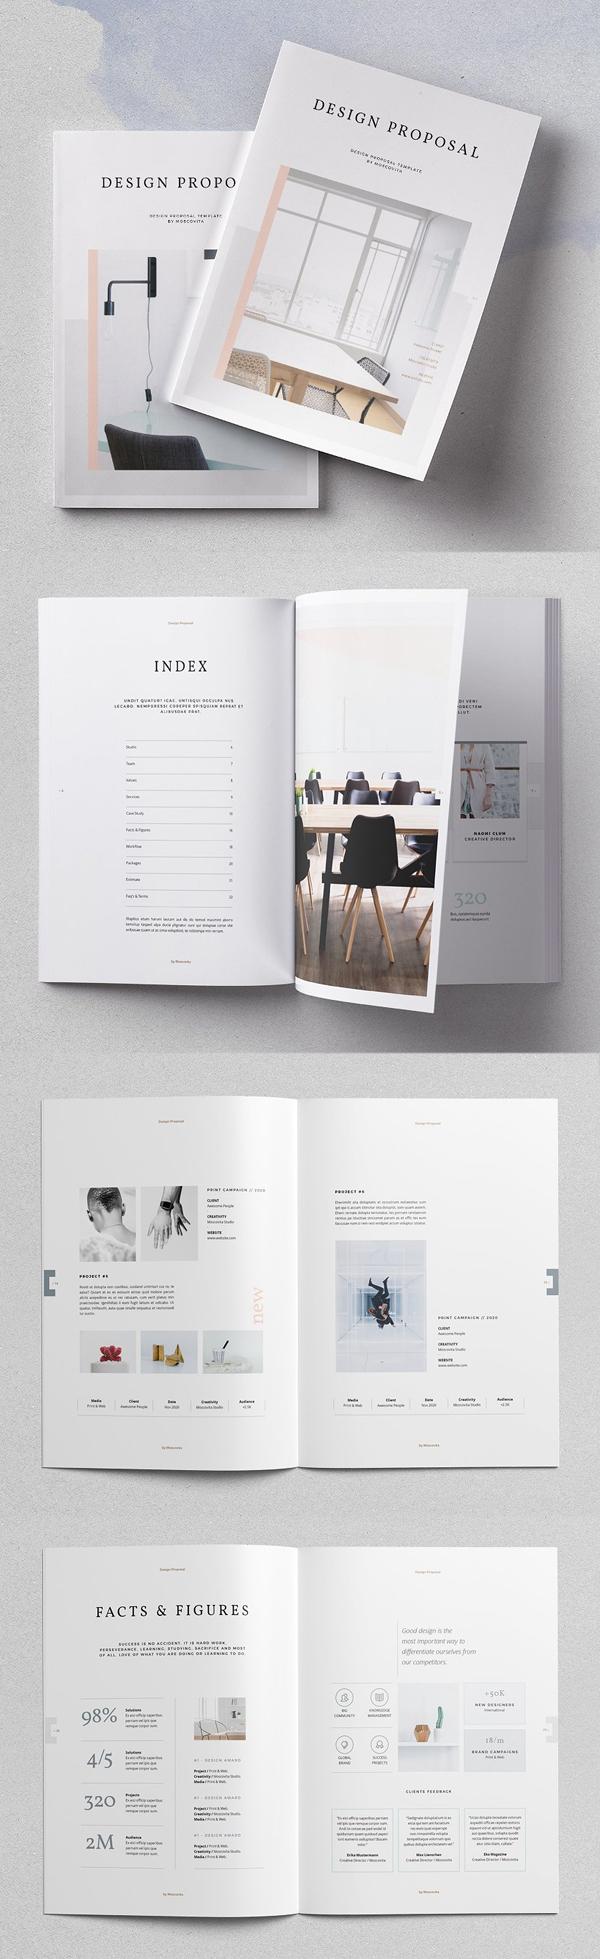 Professional Business Proposal Templates Design - 9